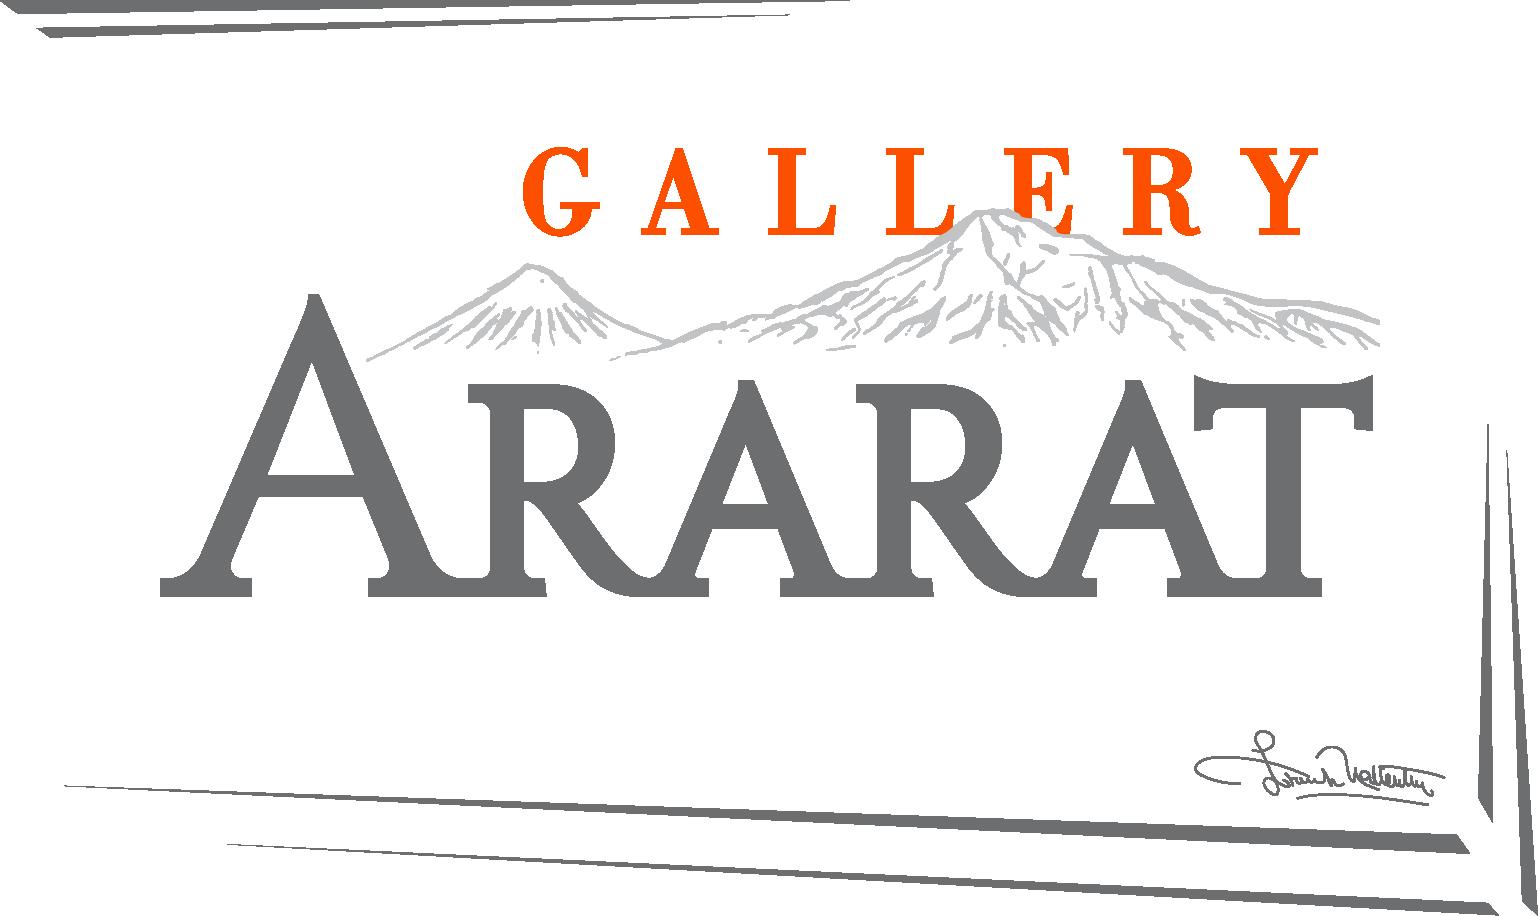 Ararat Gallery